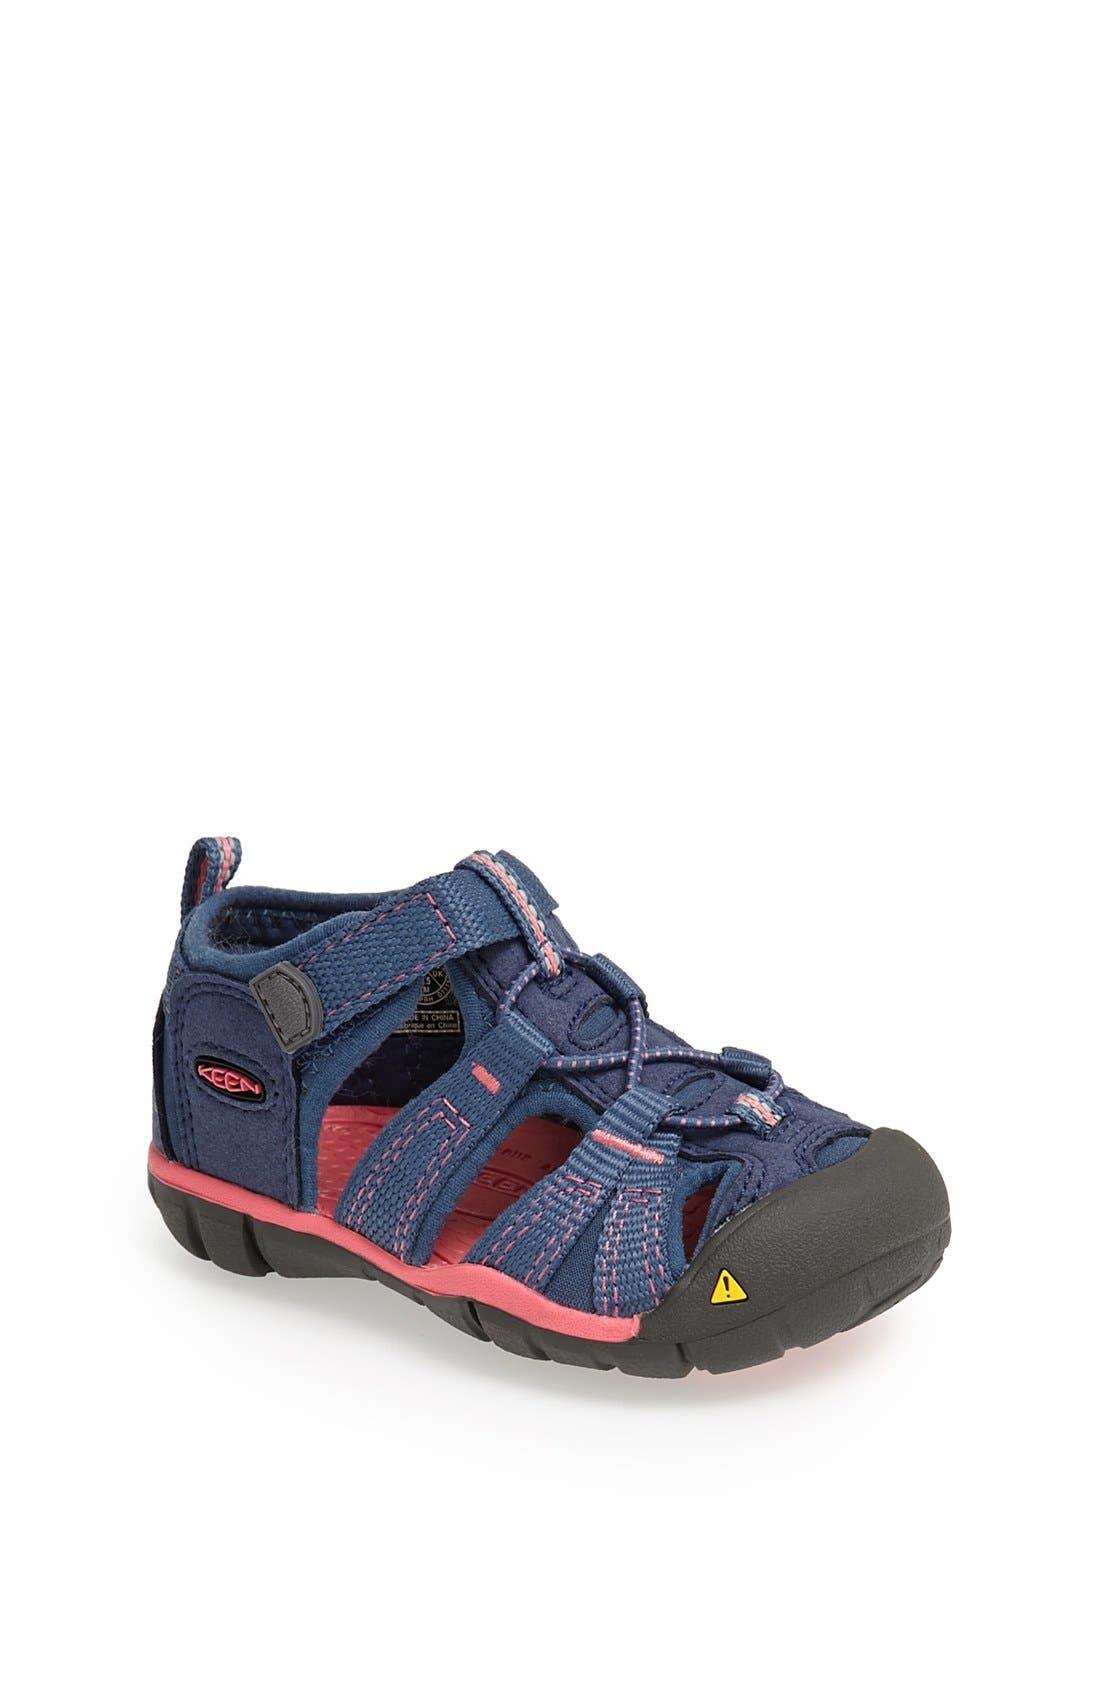 'Seacamp II' Waterproof Sandal,                         Main,                         color, Blue Rose